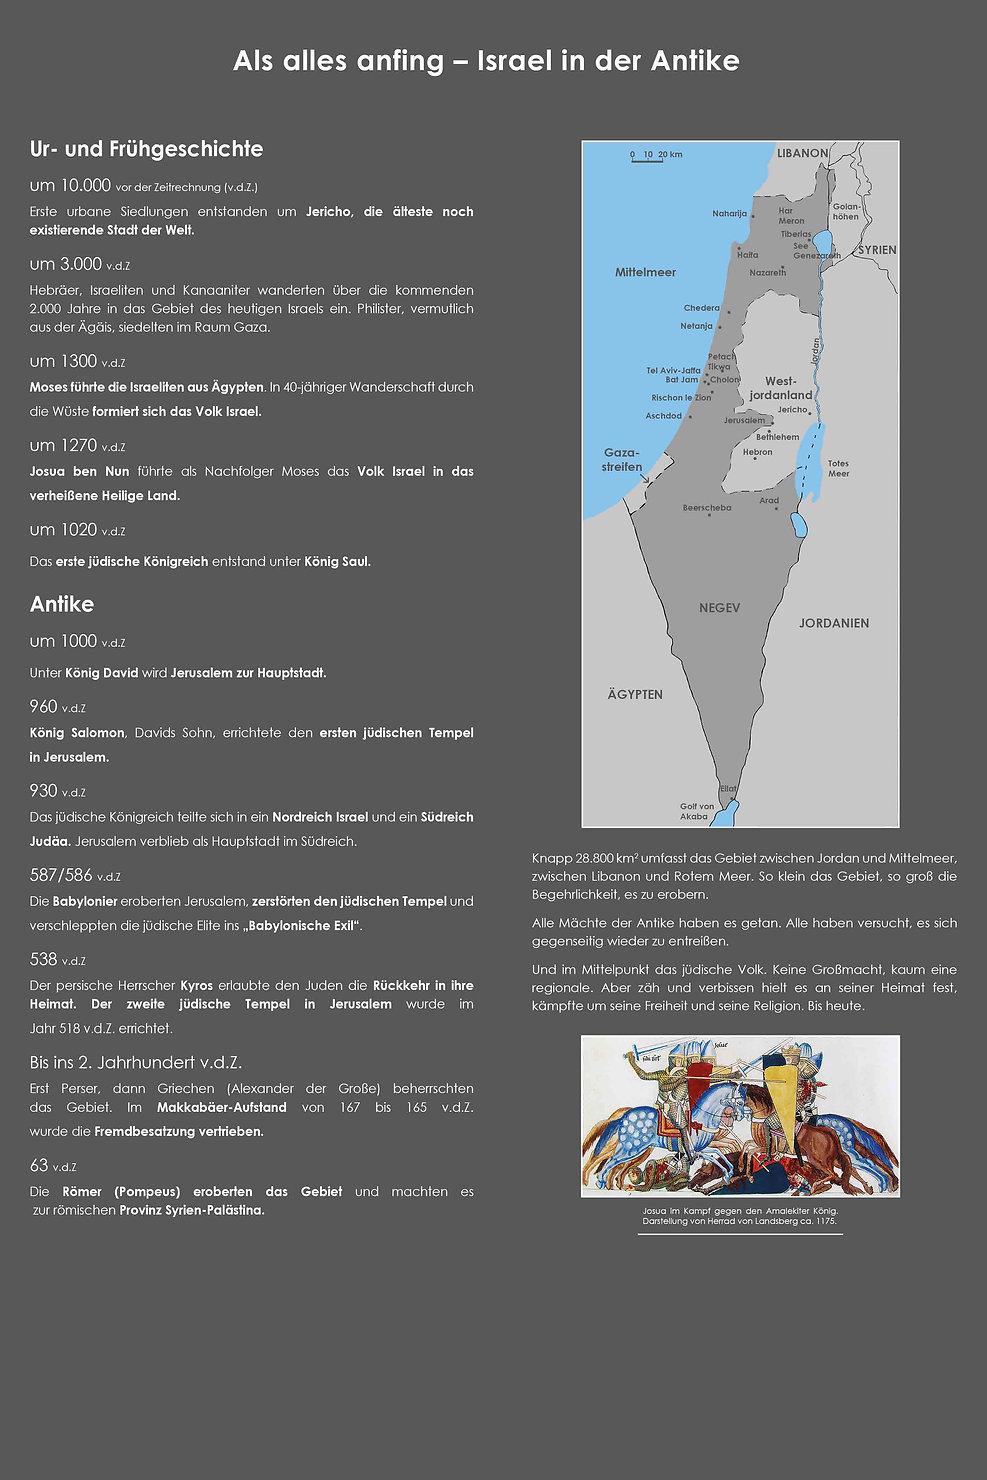 02 Als alles anfing - Israel in der Antike